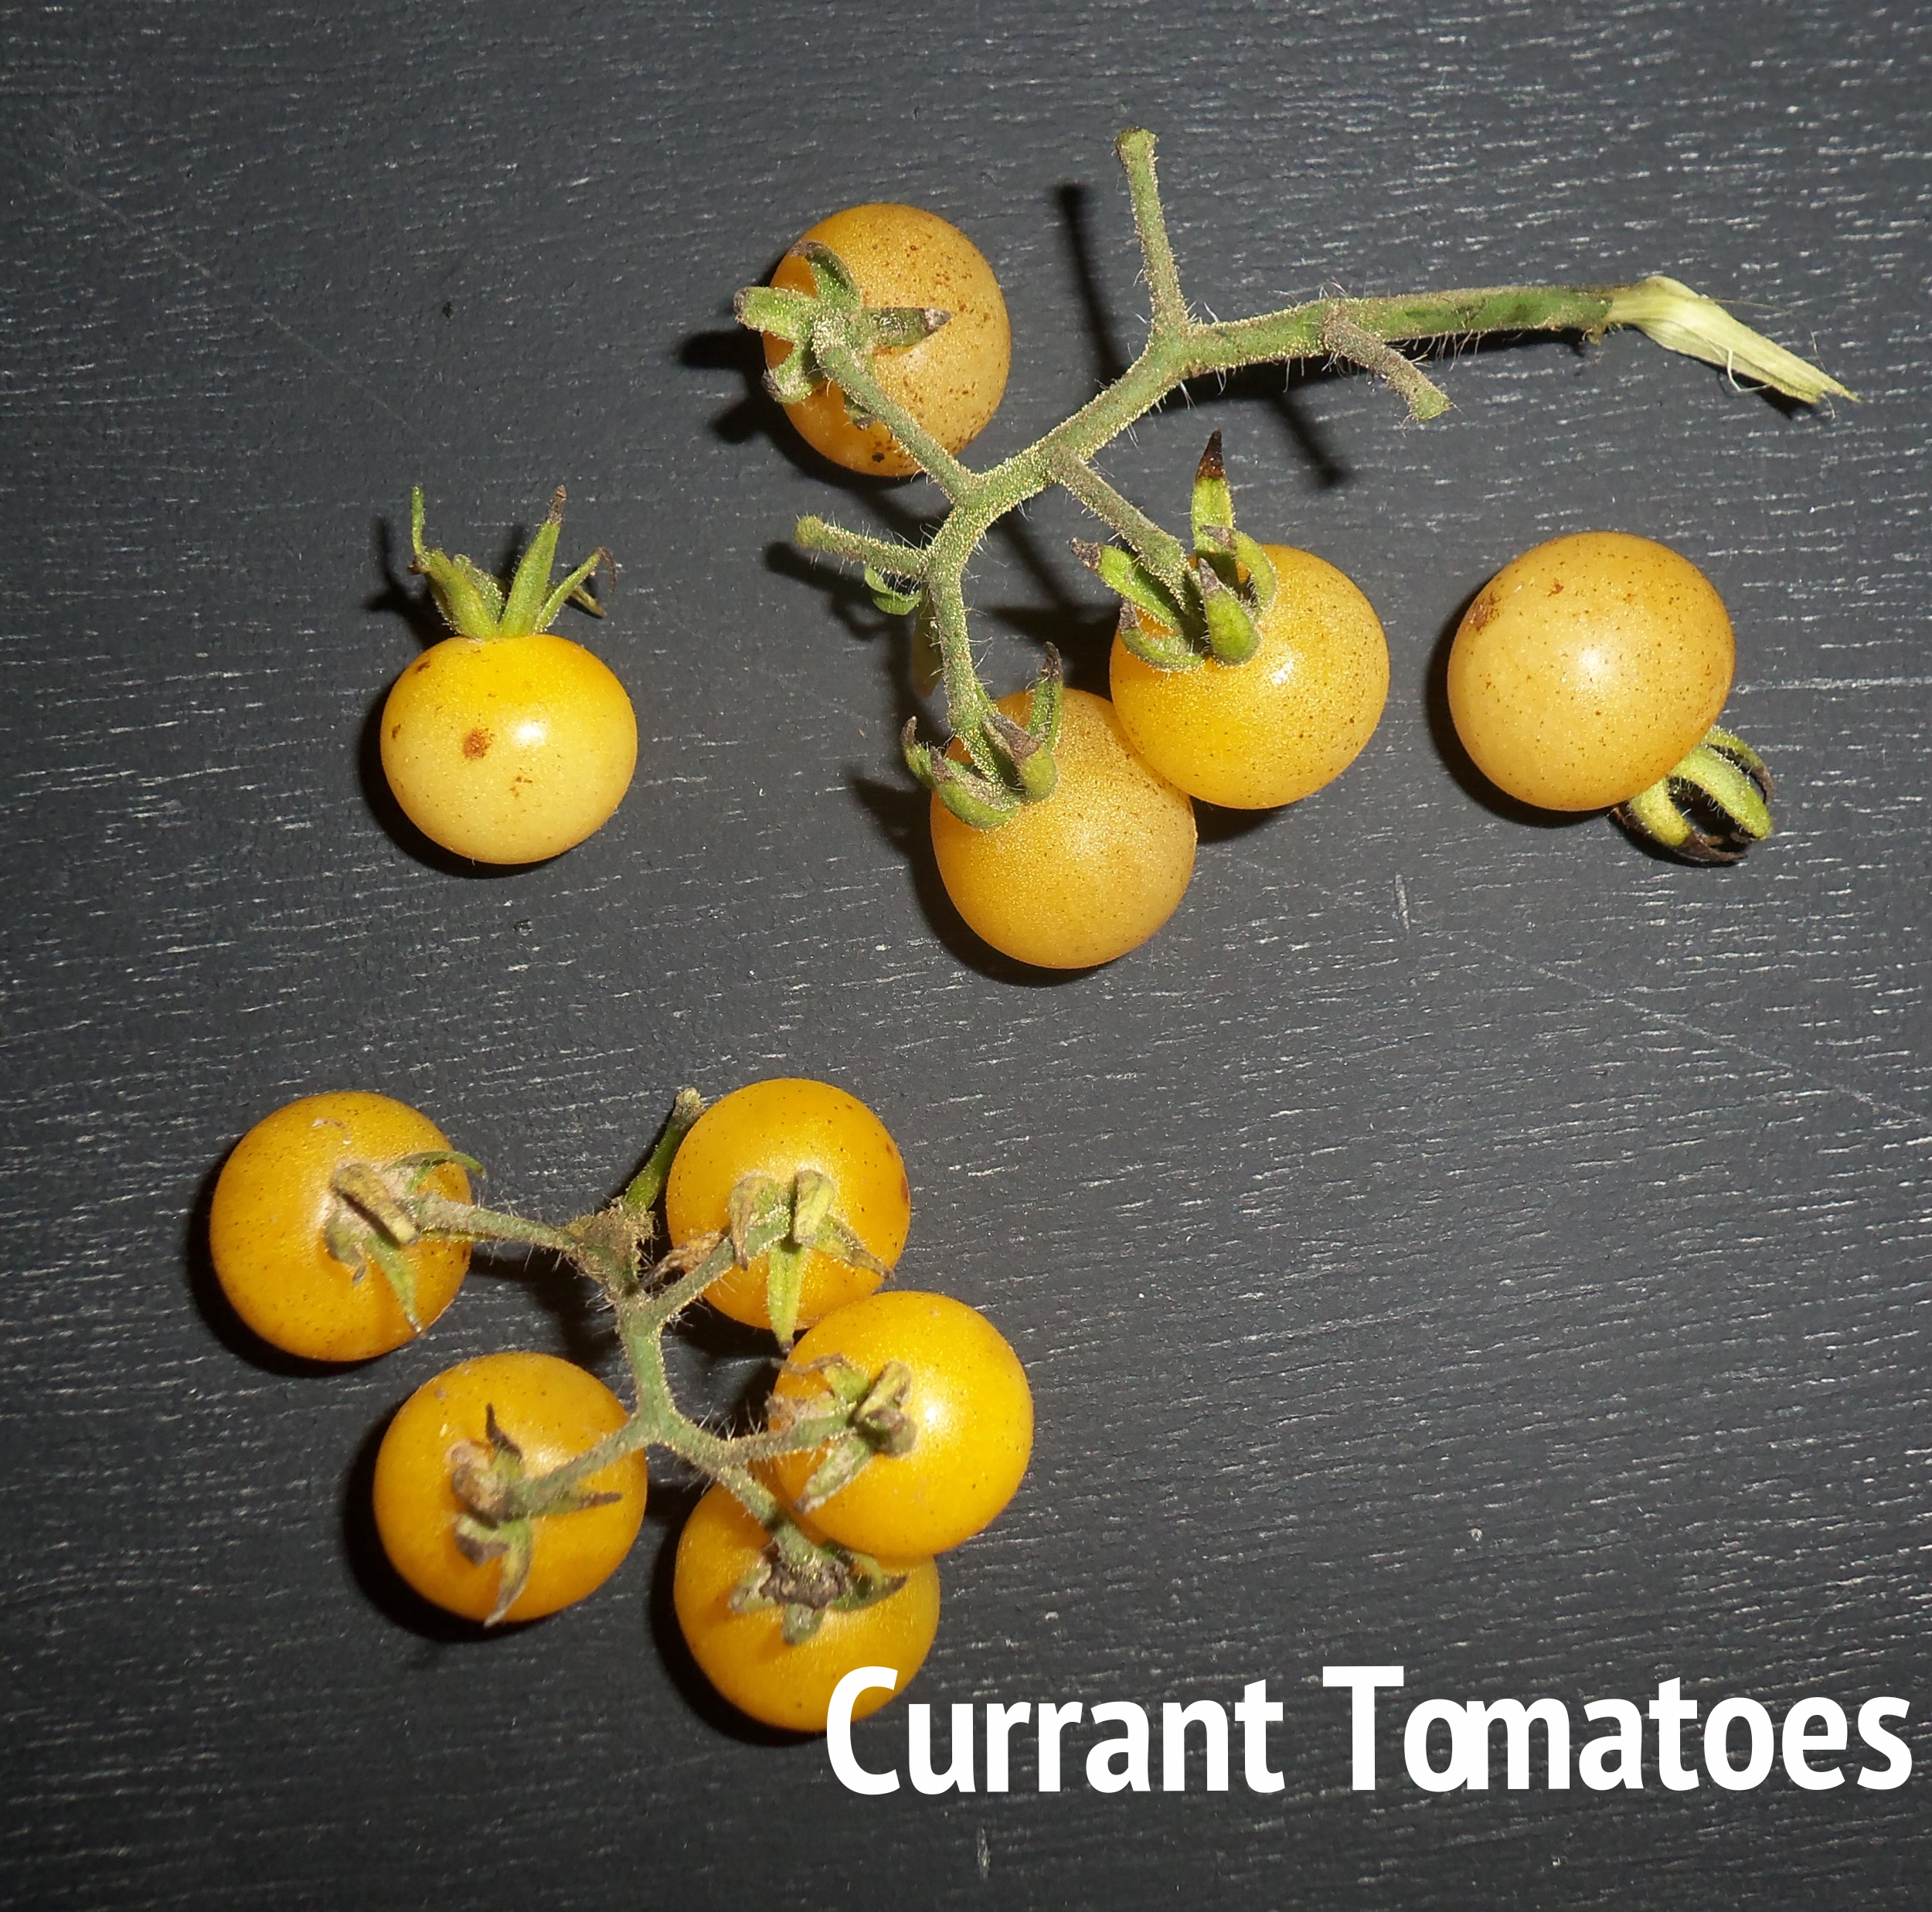 currant tomato.jpg